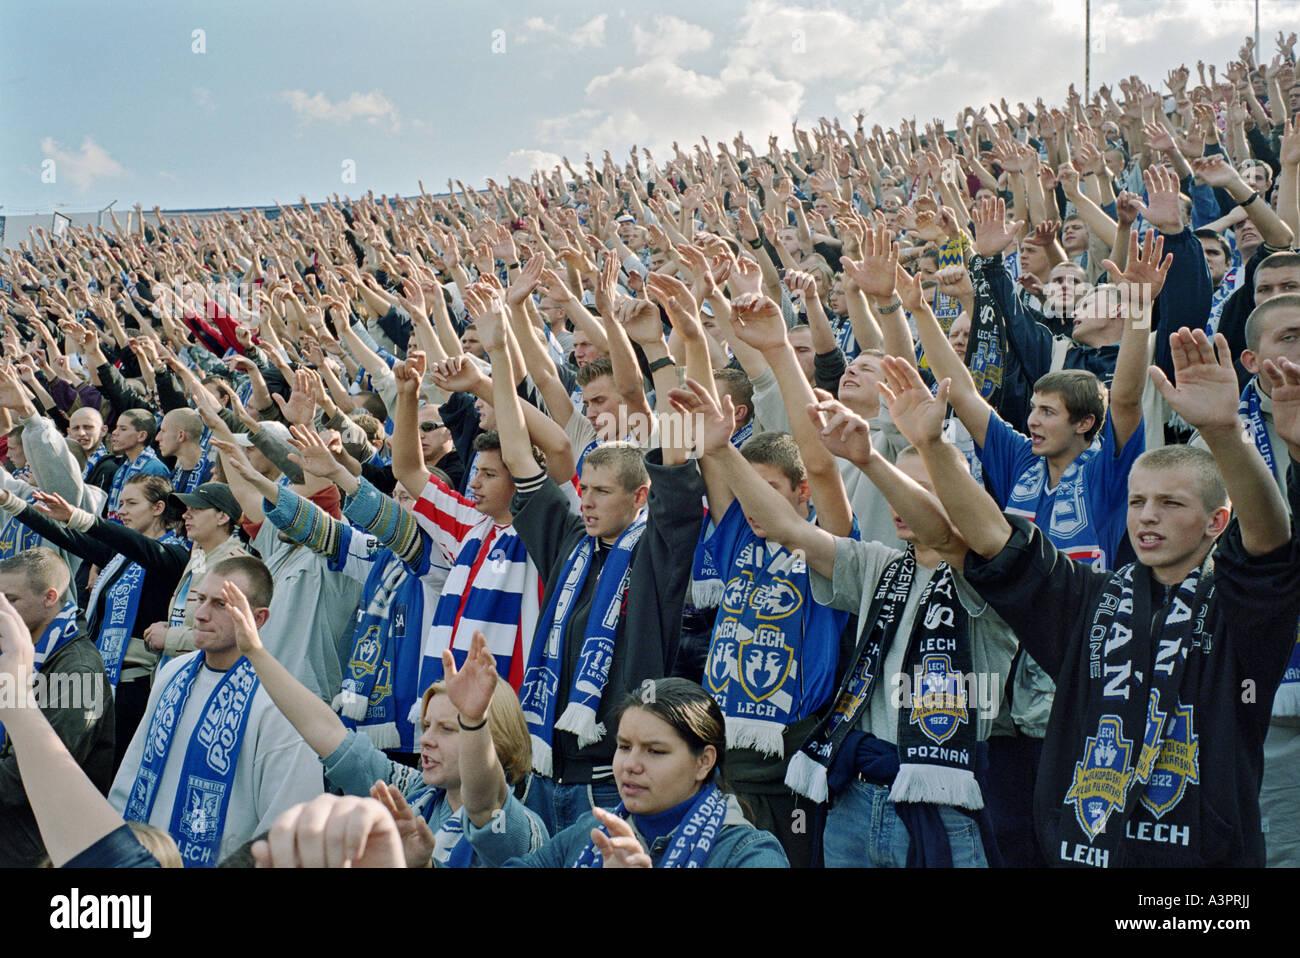 Lech Poznan News: Fans Of The Lech Poznan Football Club At A Stadium, Poznan